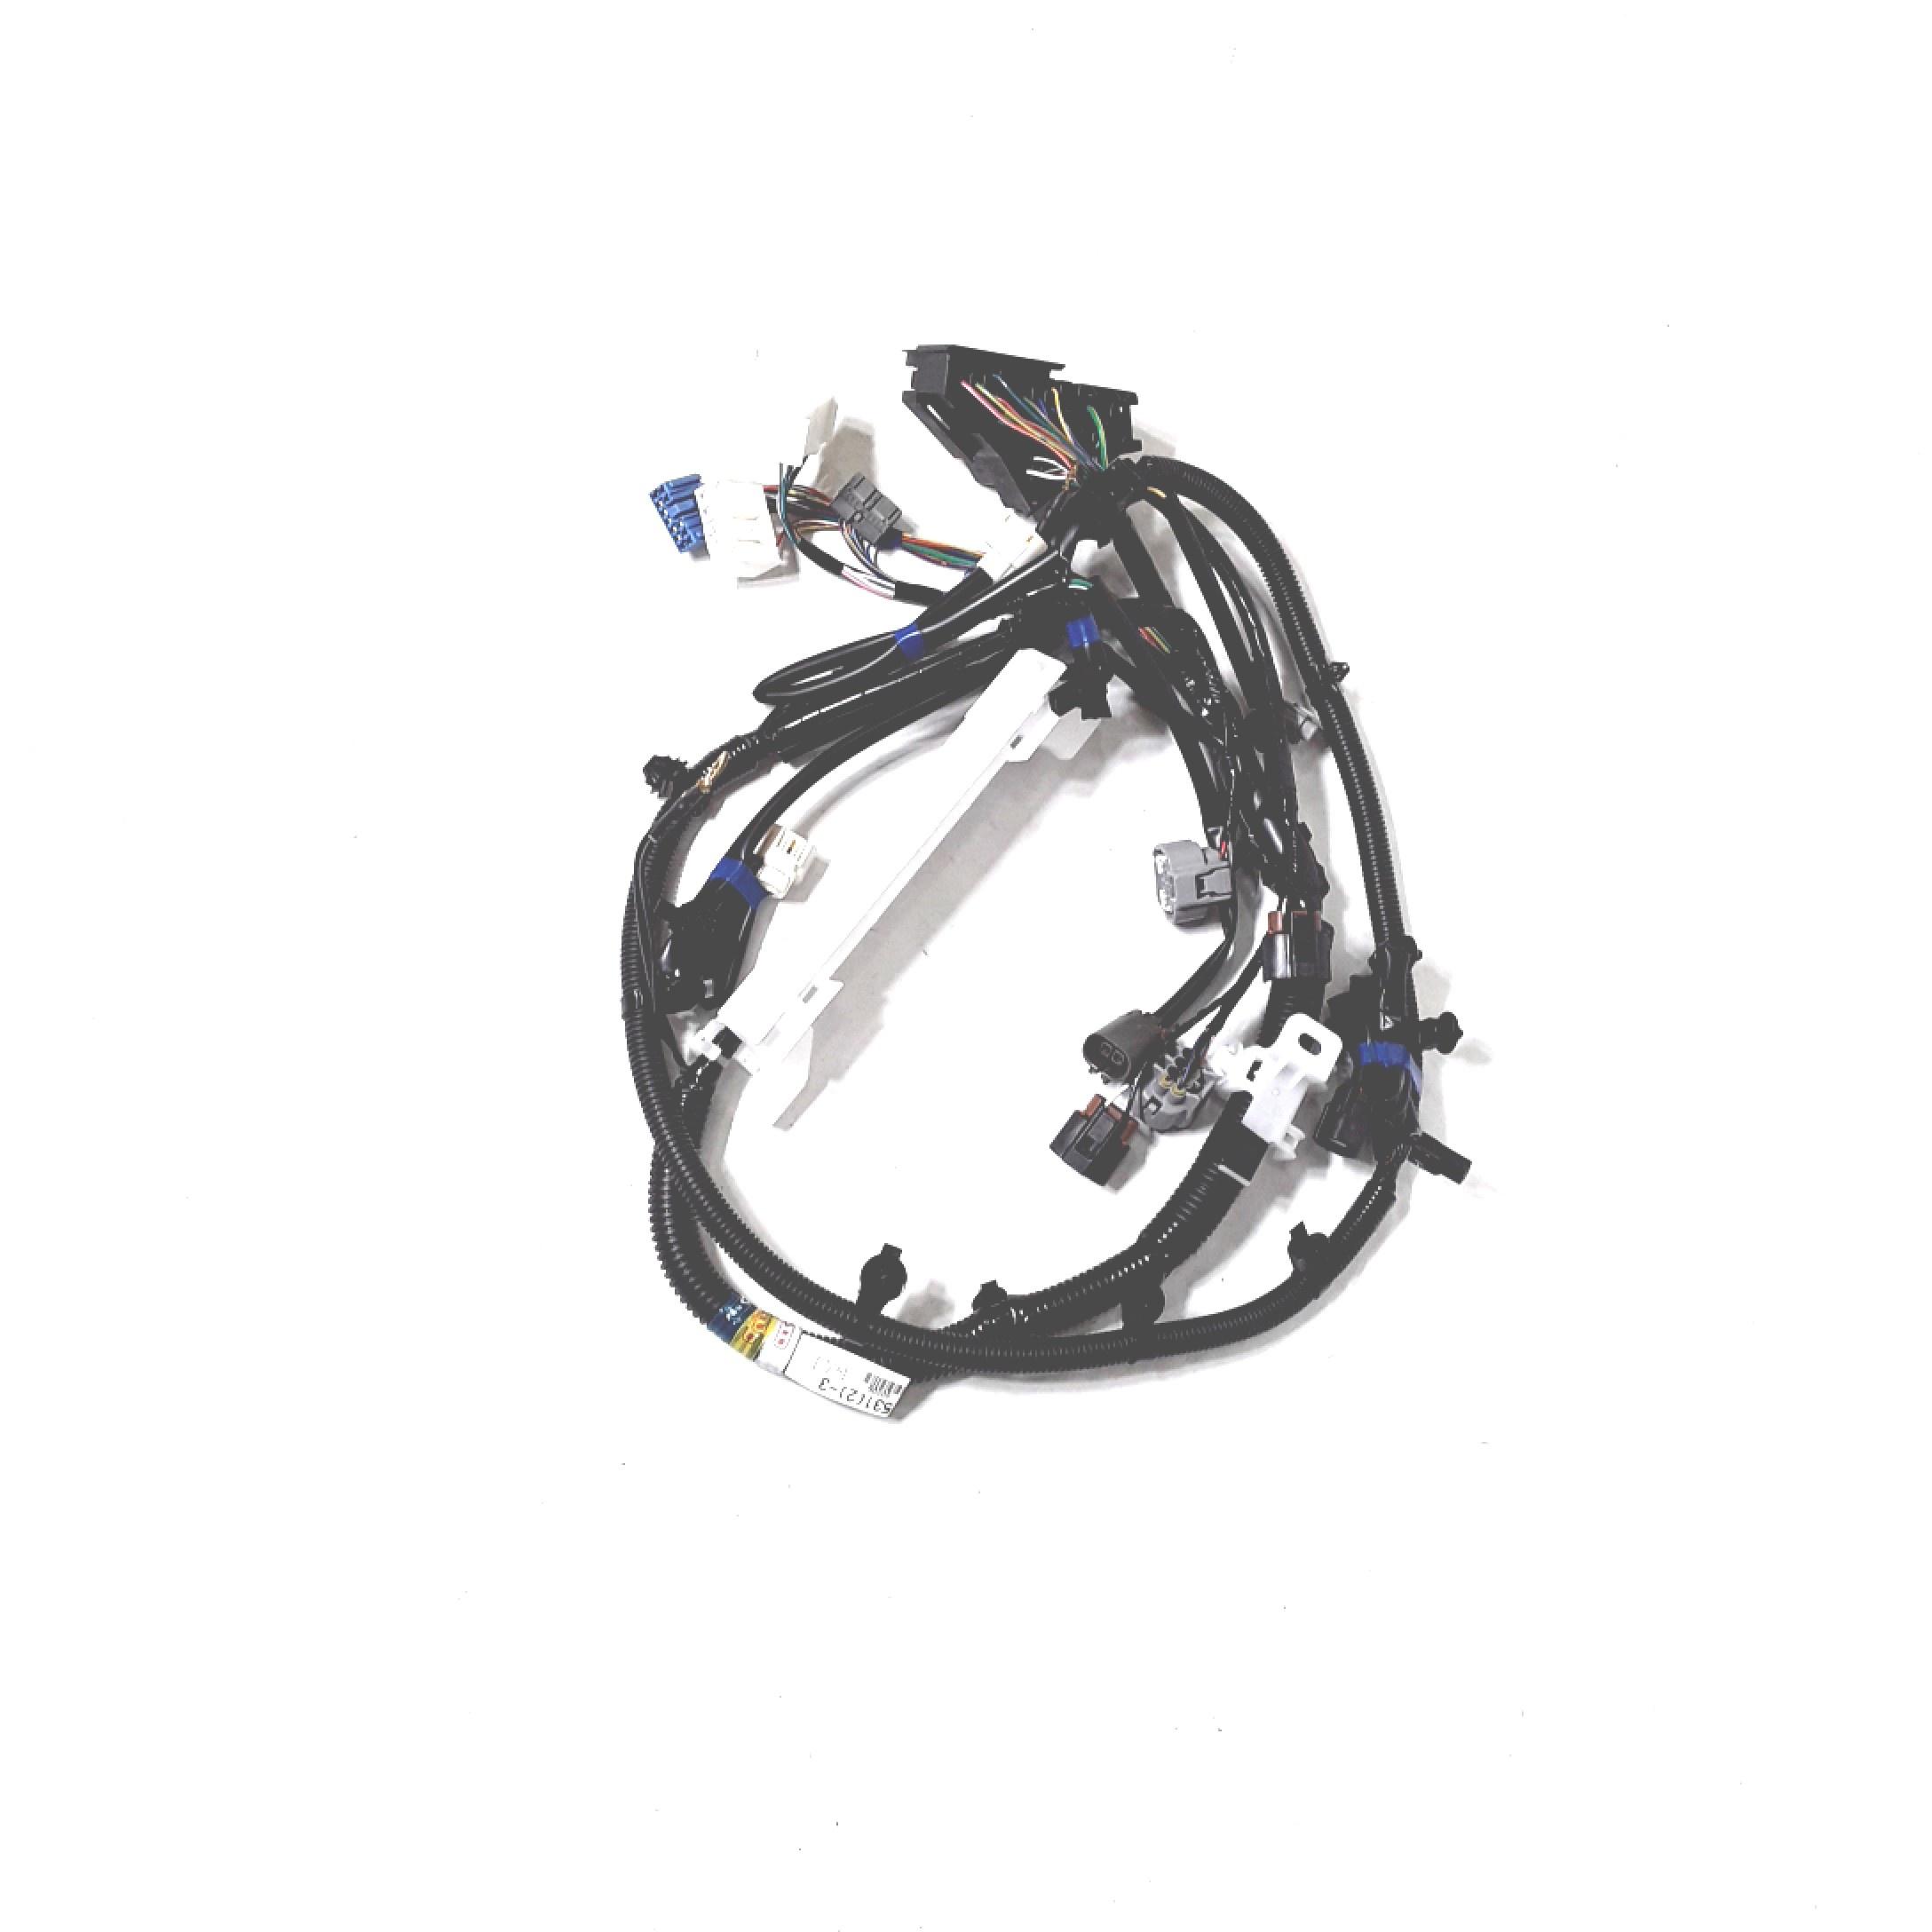 2014 Subaru Crosstrek Harness-front  Wiring  Main  Electrical